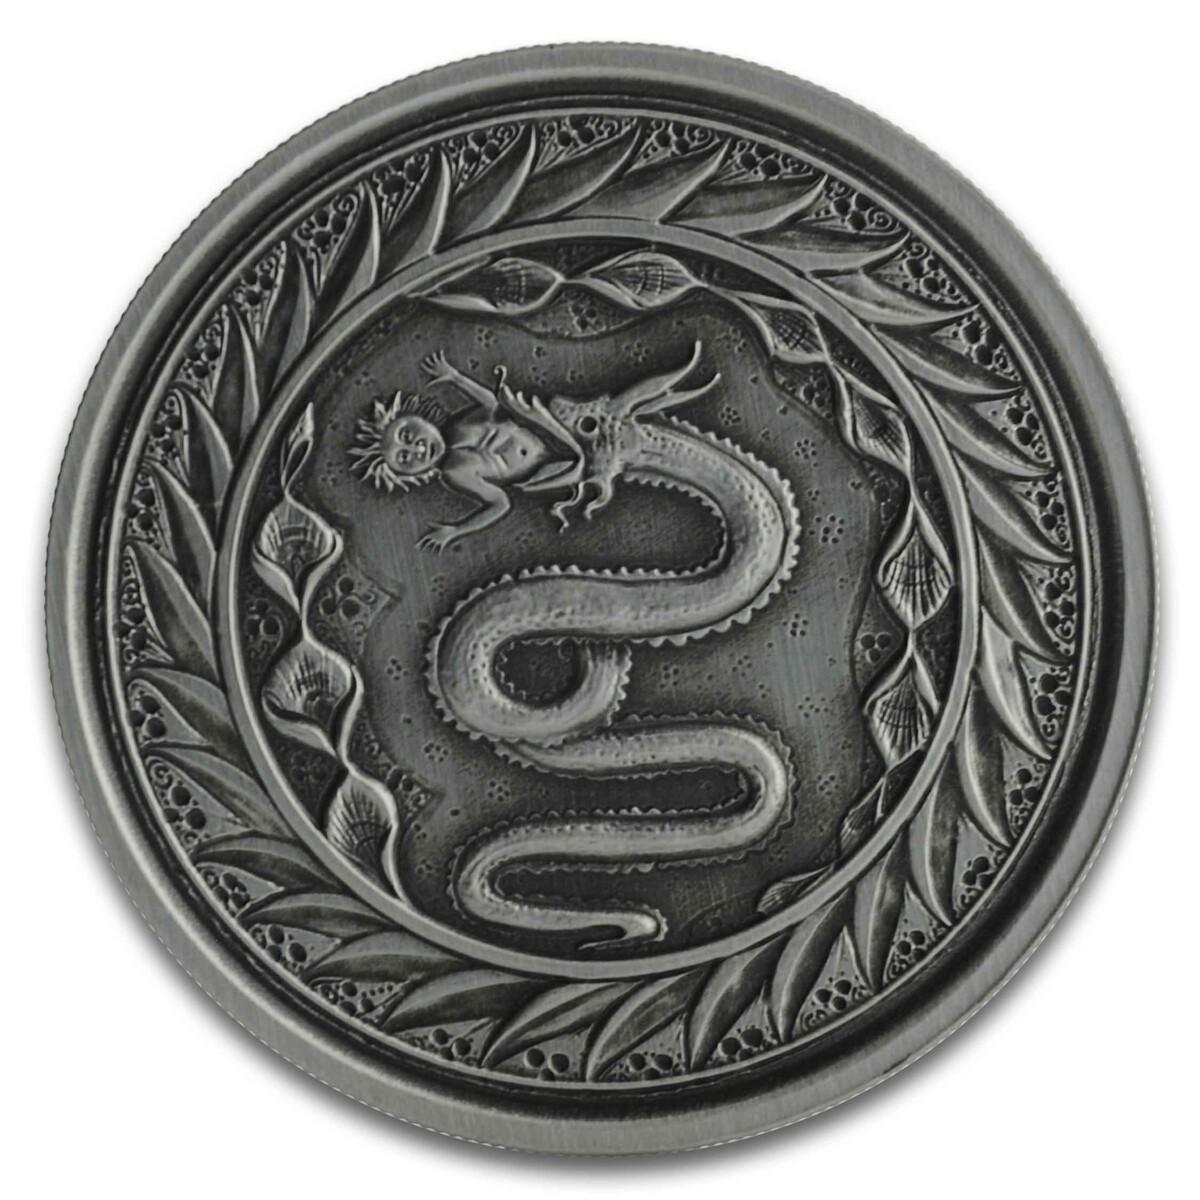 SERPENT OF MILAN 2020 Samoa 1oz Silver Antiqued Coin